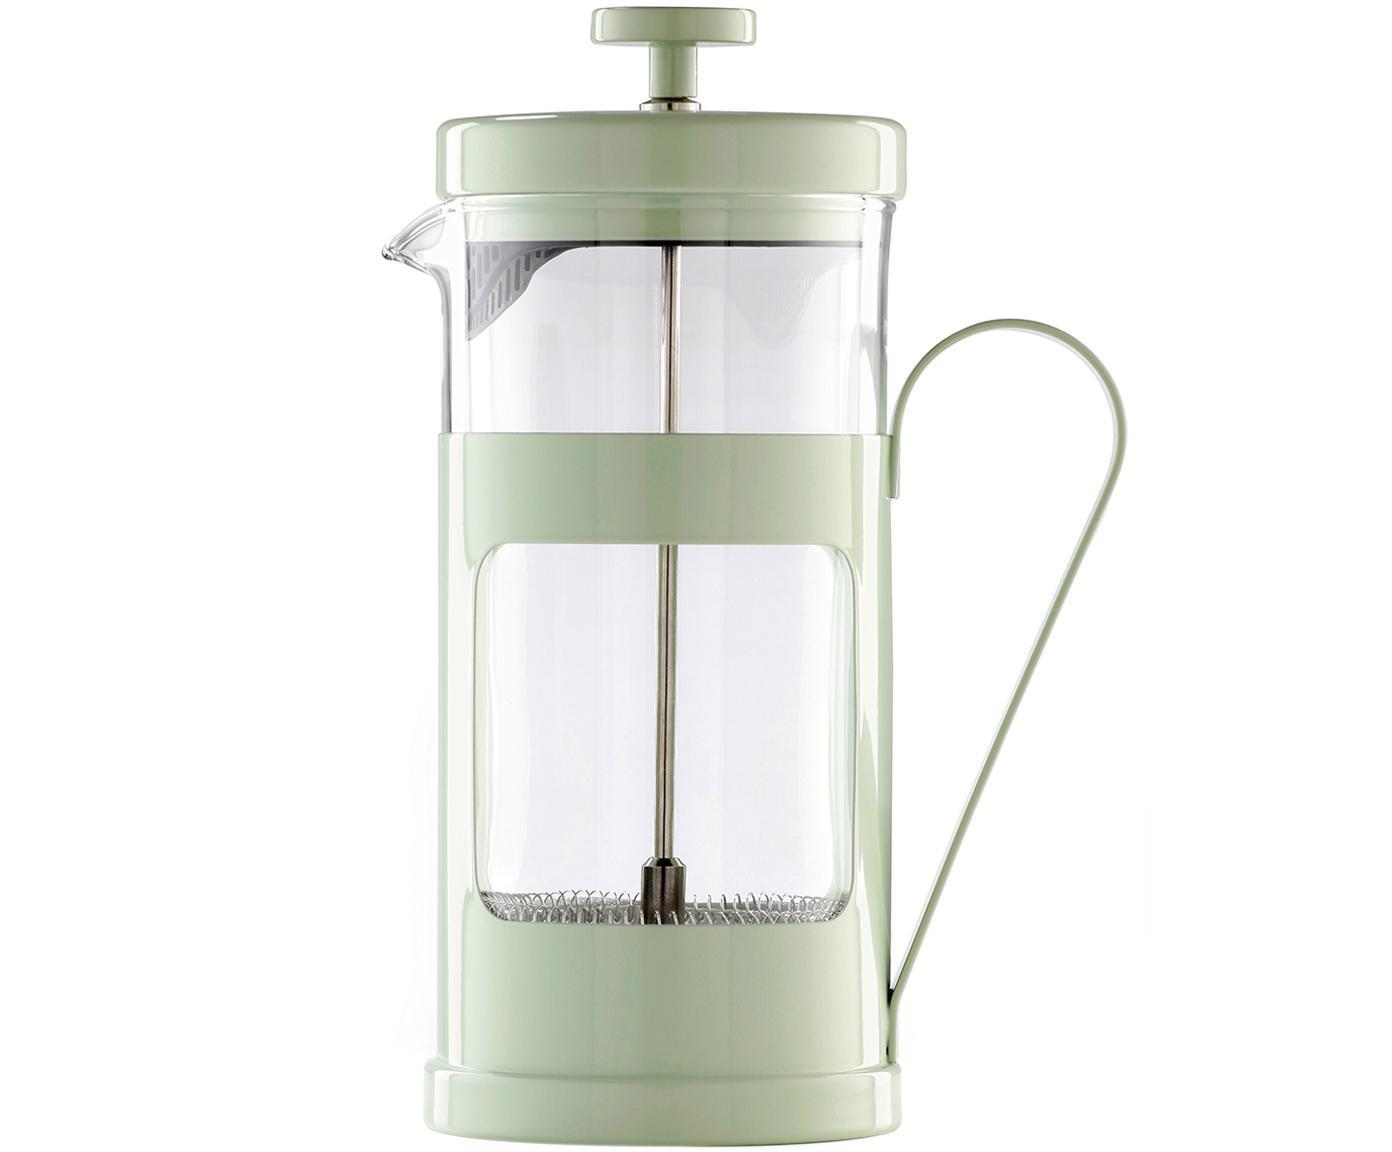 Cafetière Monaco, Gelakt edelstaal, borosilicaatglas, Transparant, mintkleurig, 1 L